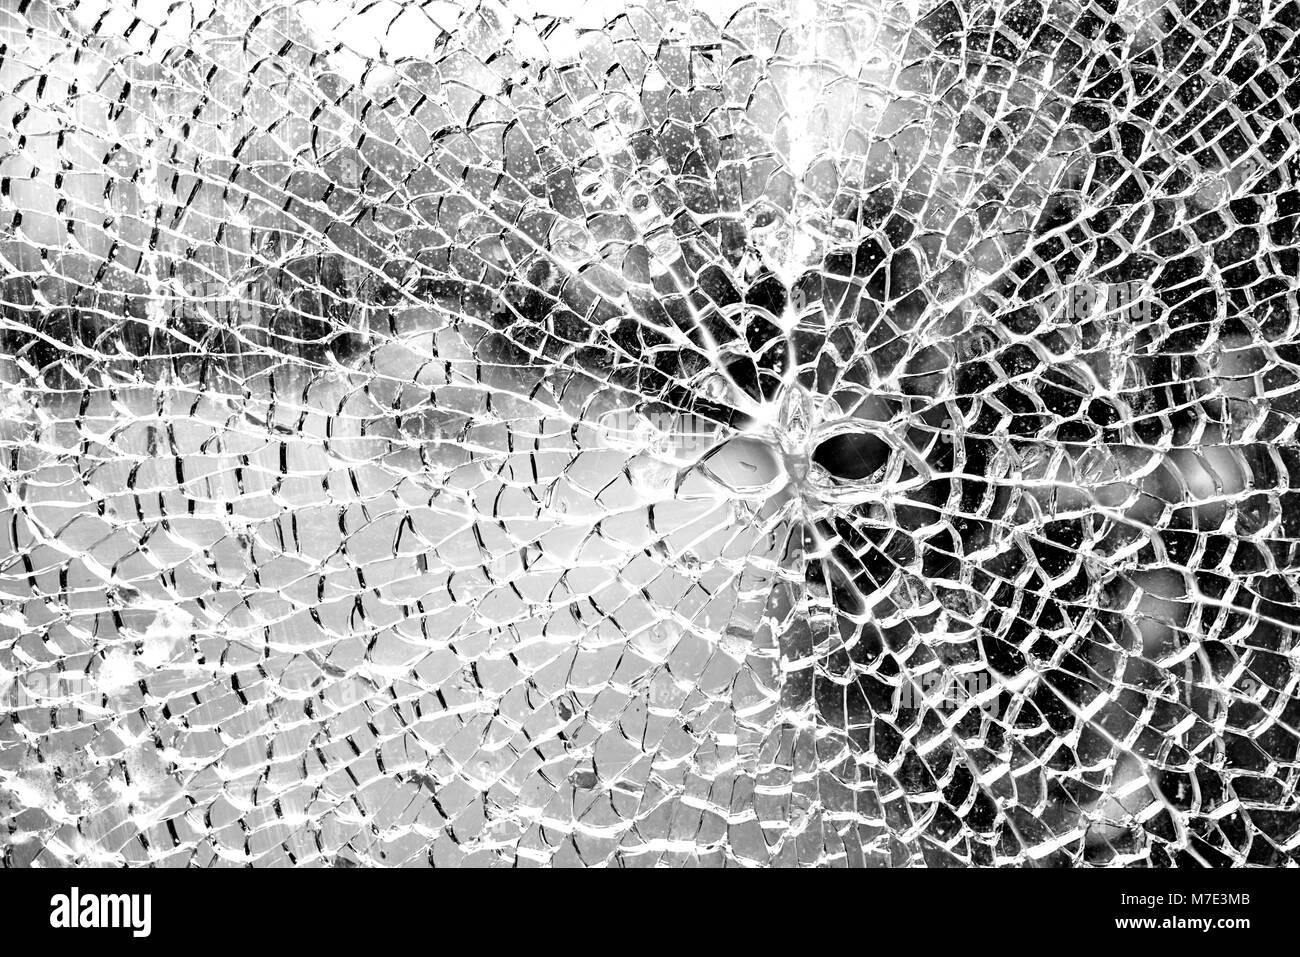 Zersprungene Glasscheibe - Stock Image